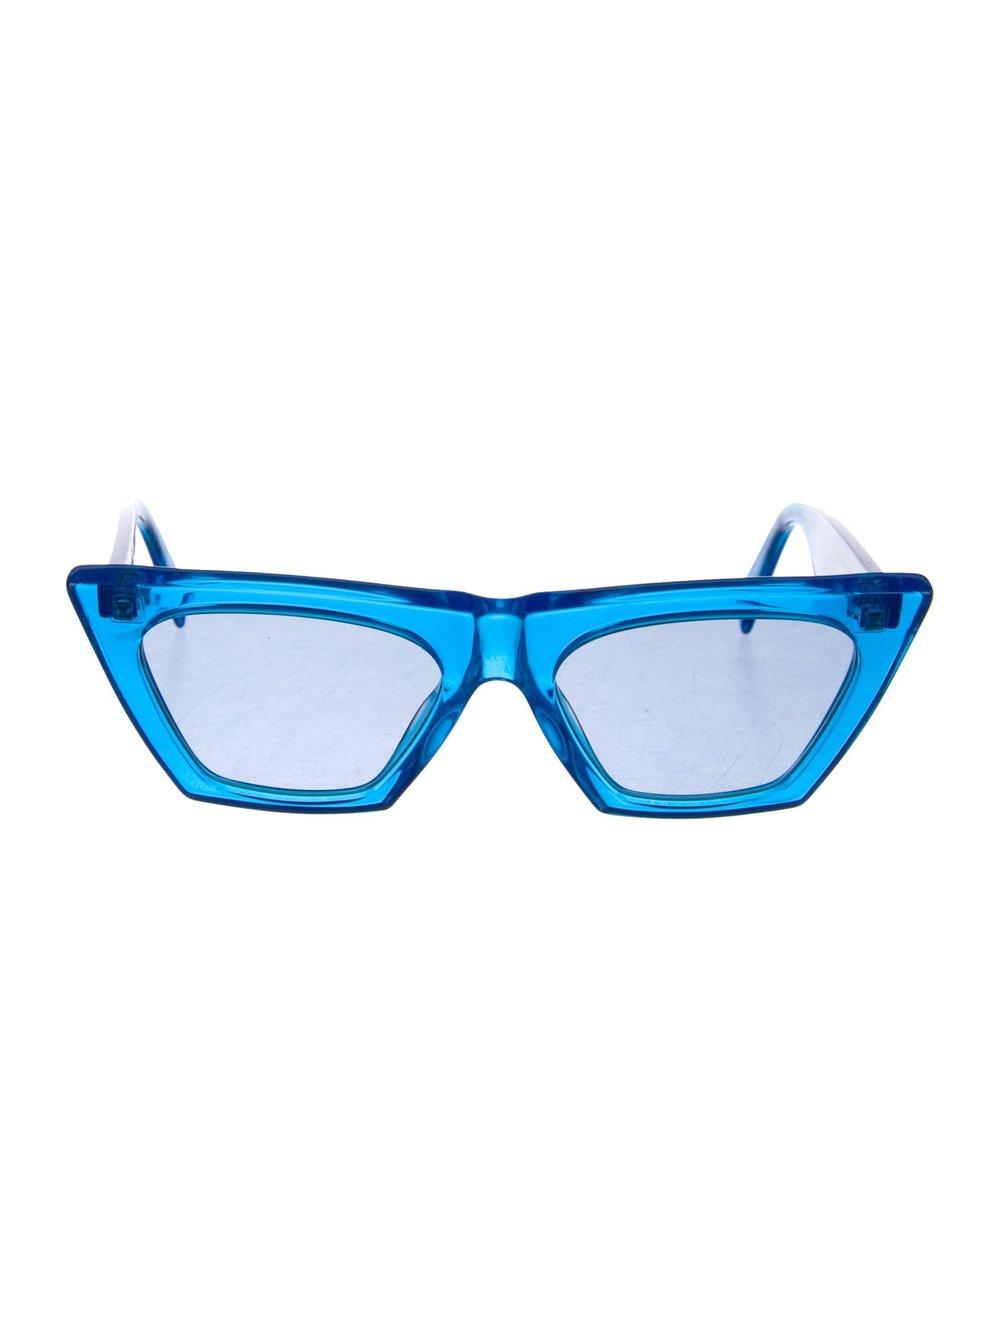 Celine Gegku Edge sunglasses